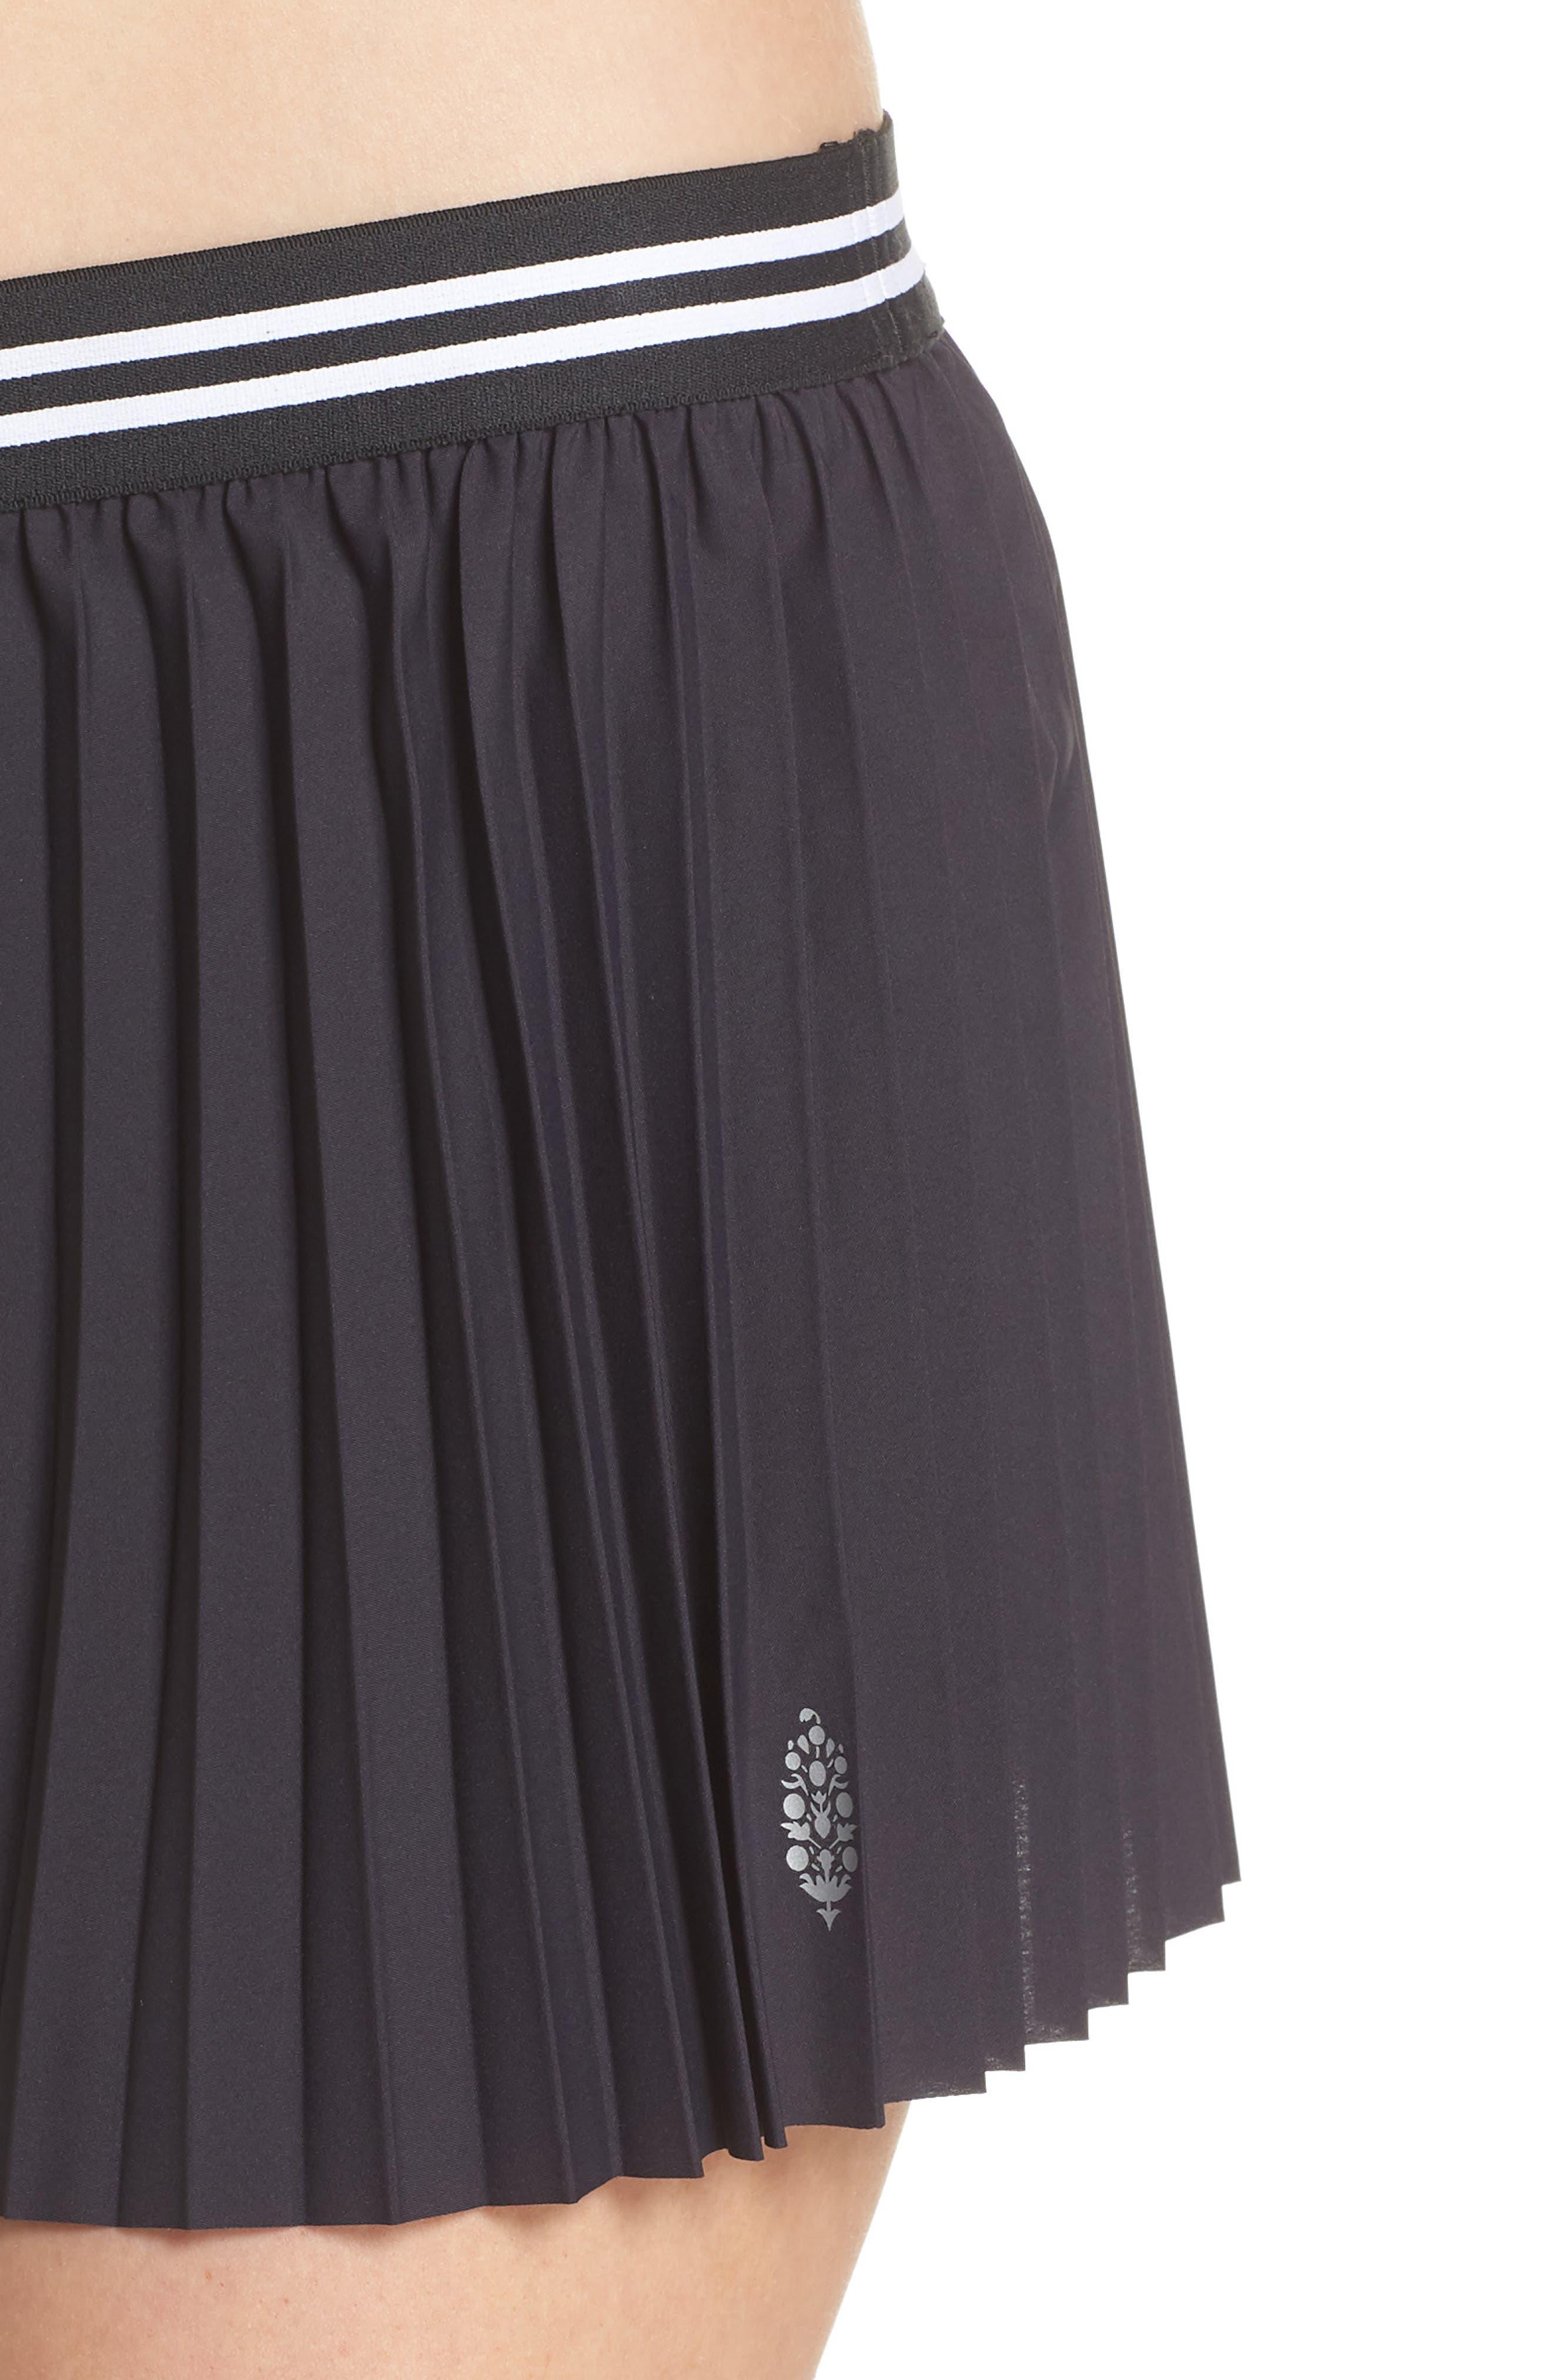 Zephyr Shorts,                             Alternate thumbnail 4, color,                             001